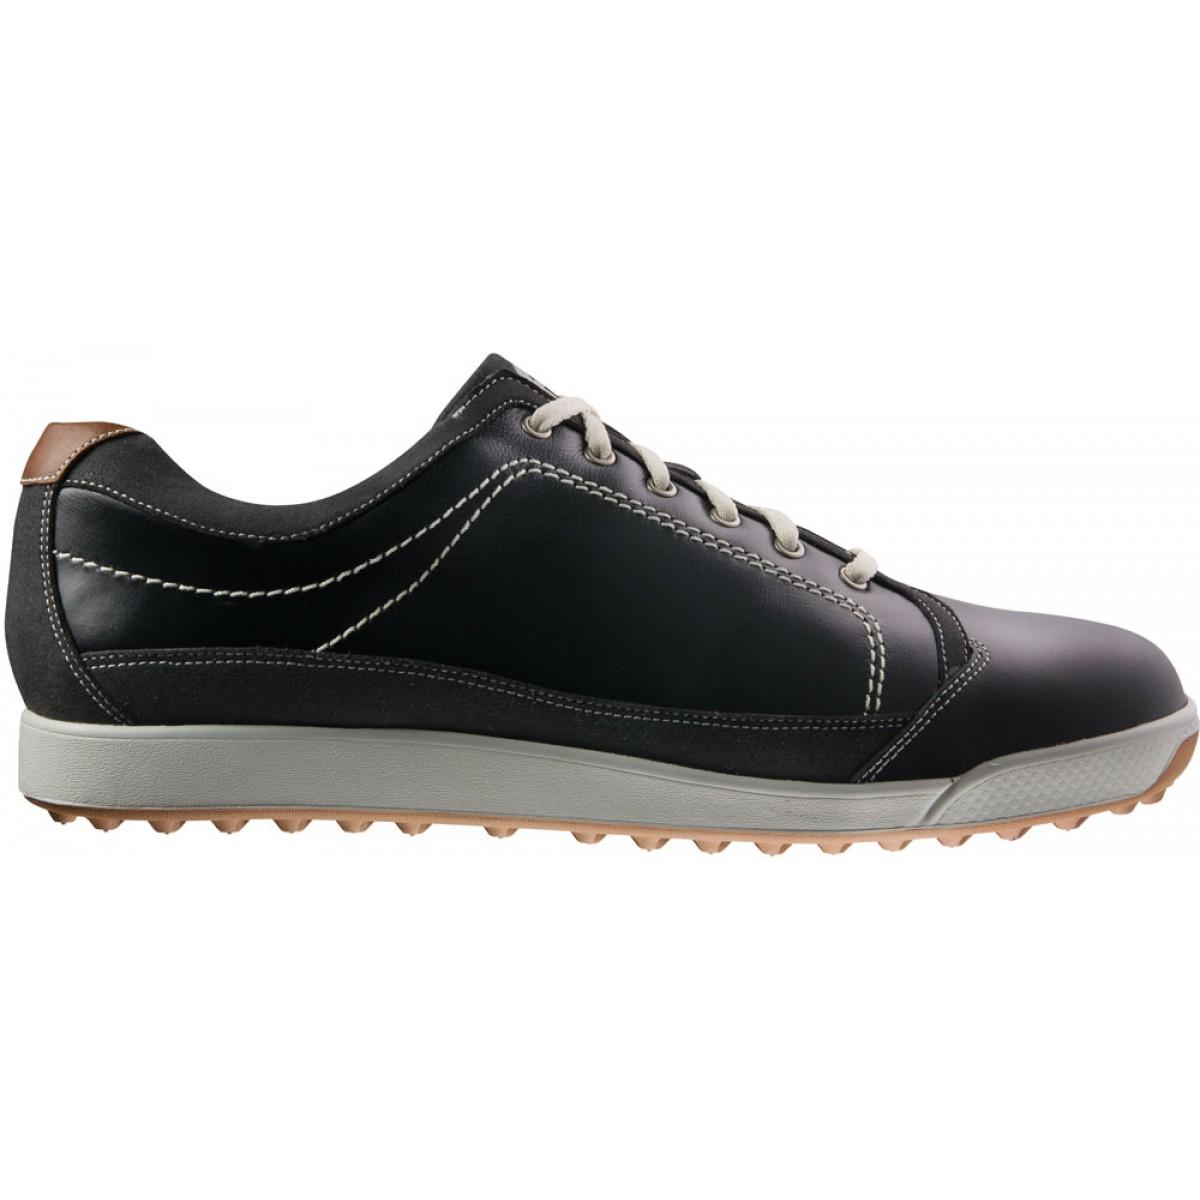 new mens fj footjoy contour casual golf shoes choose